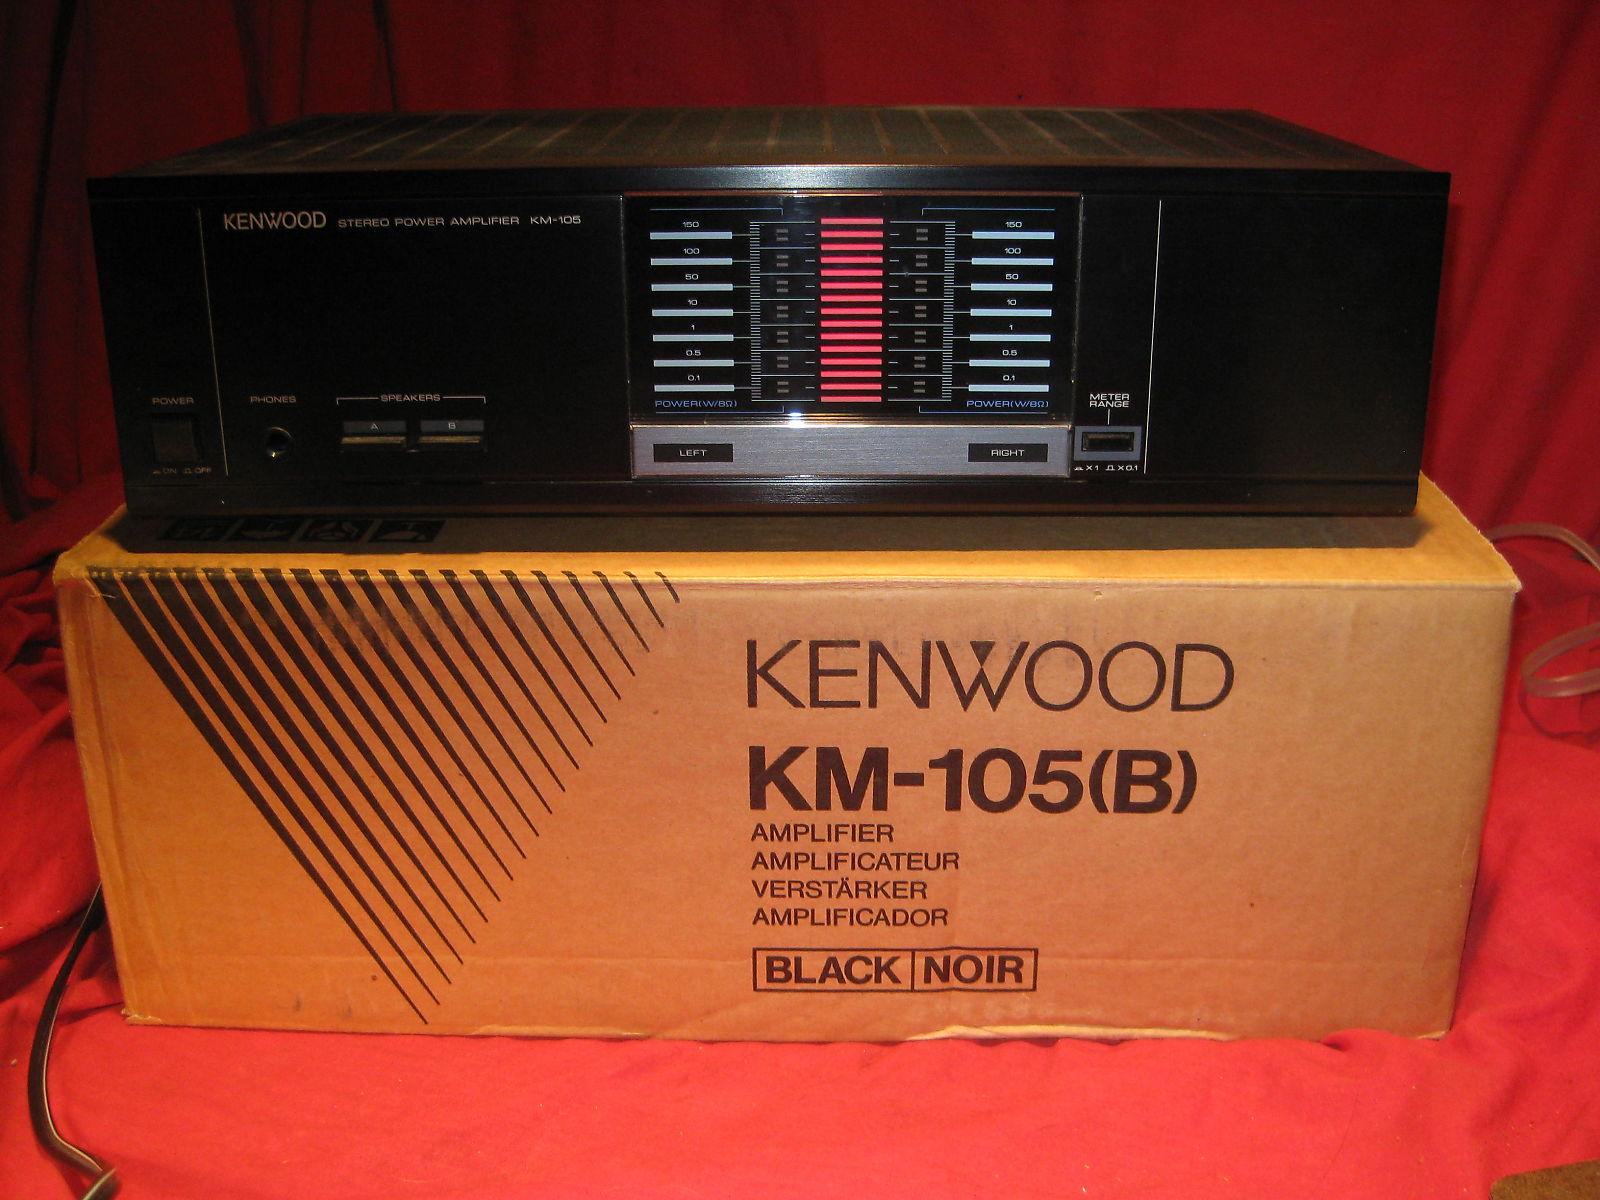 Kenwood km 105 manual on